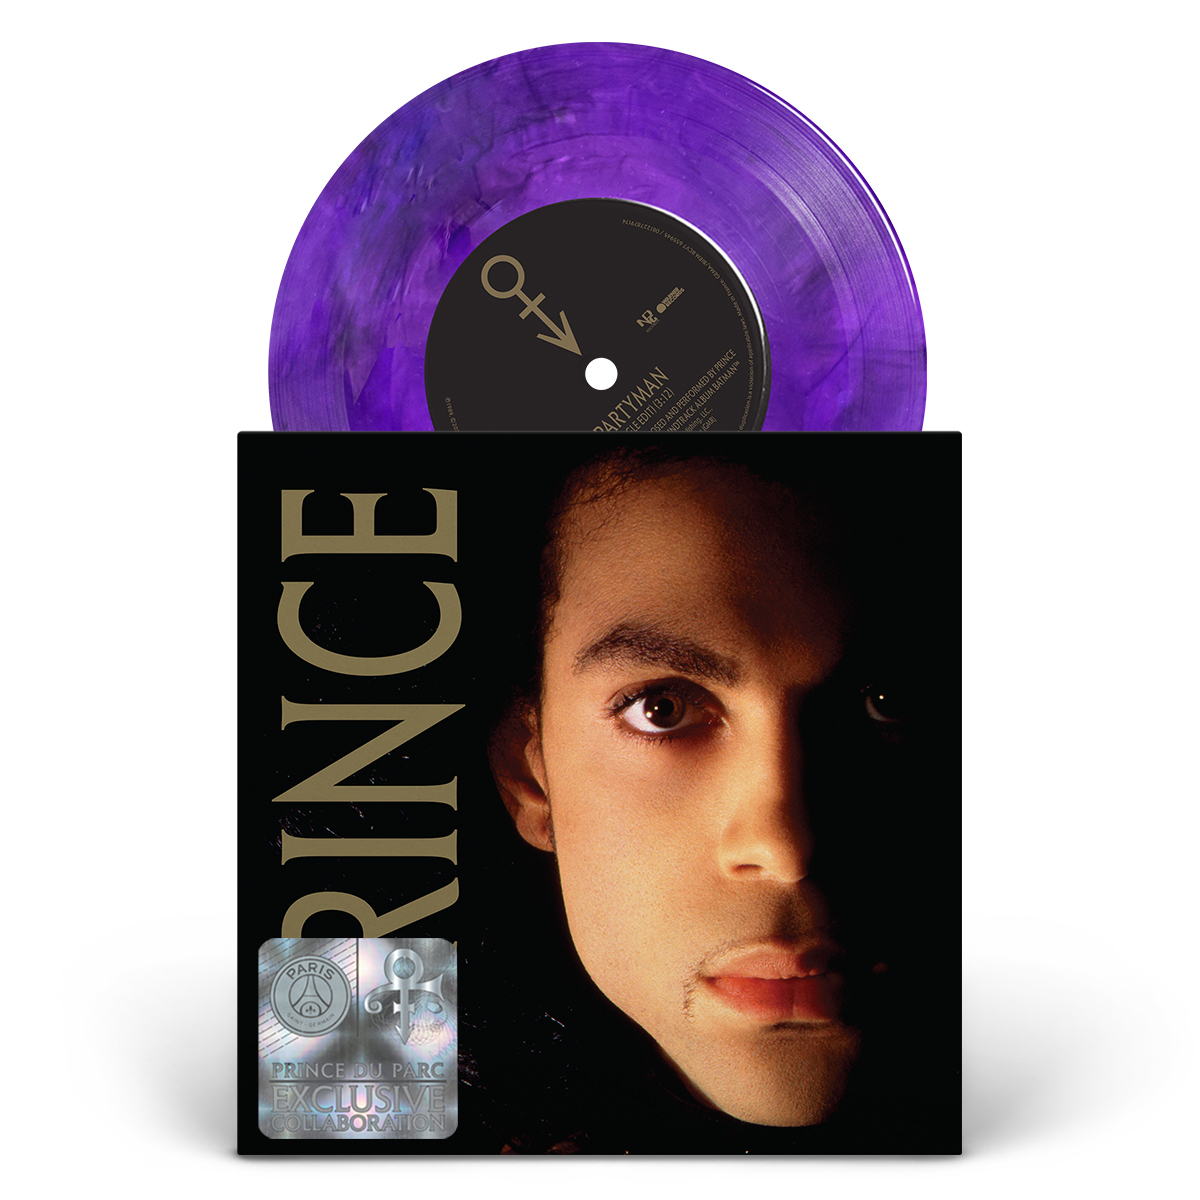 "Partyman 7"" Exclusive Limited Edition Purple Vinyl (PSG)"